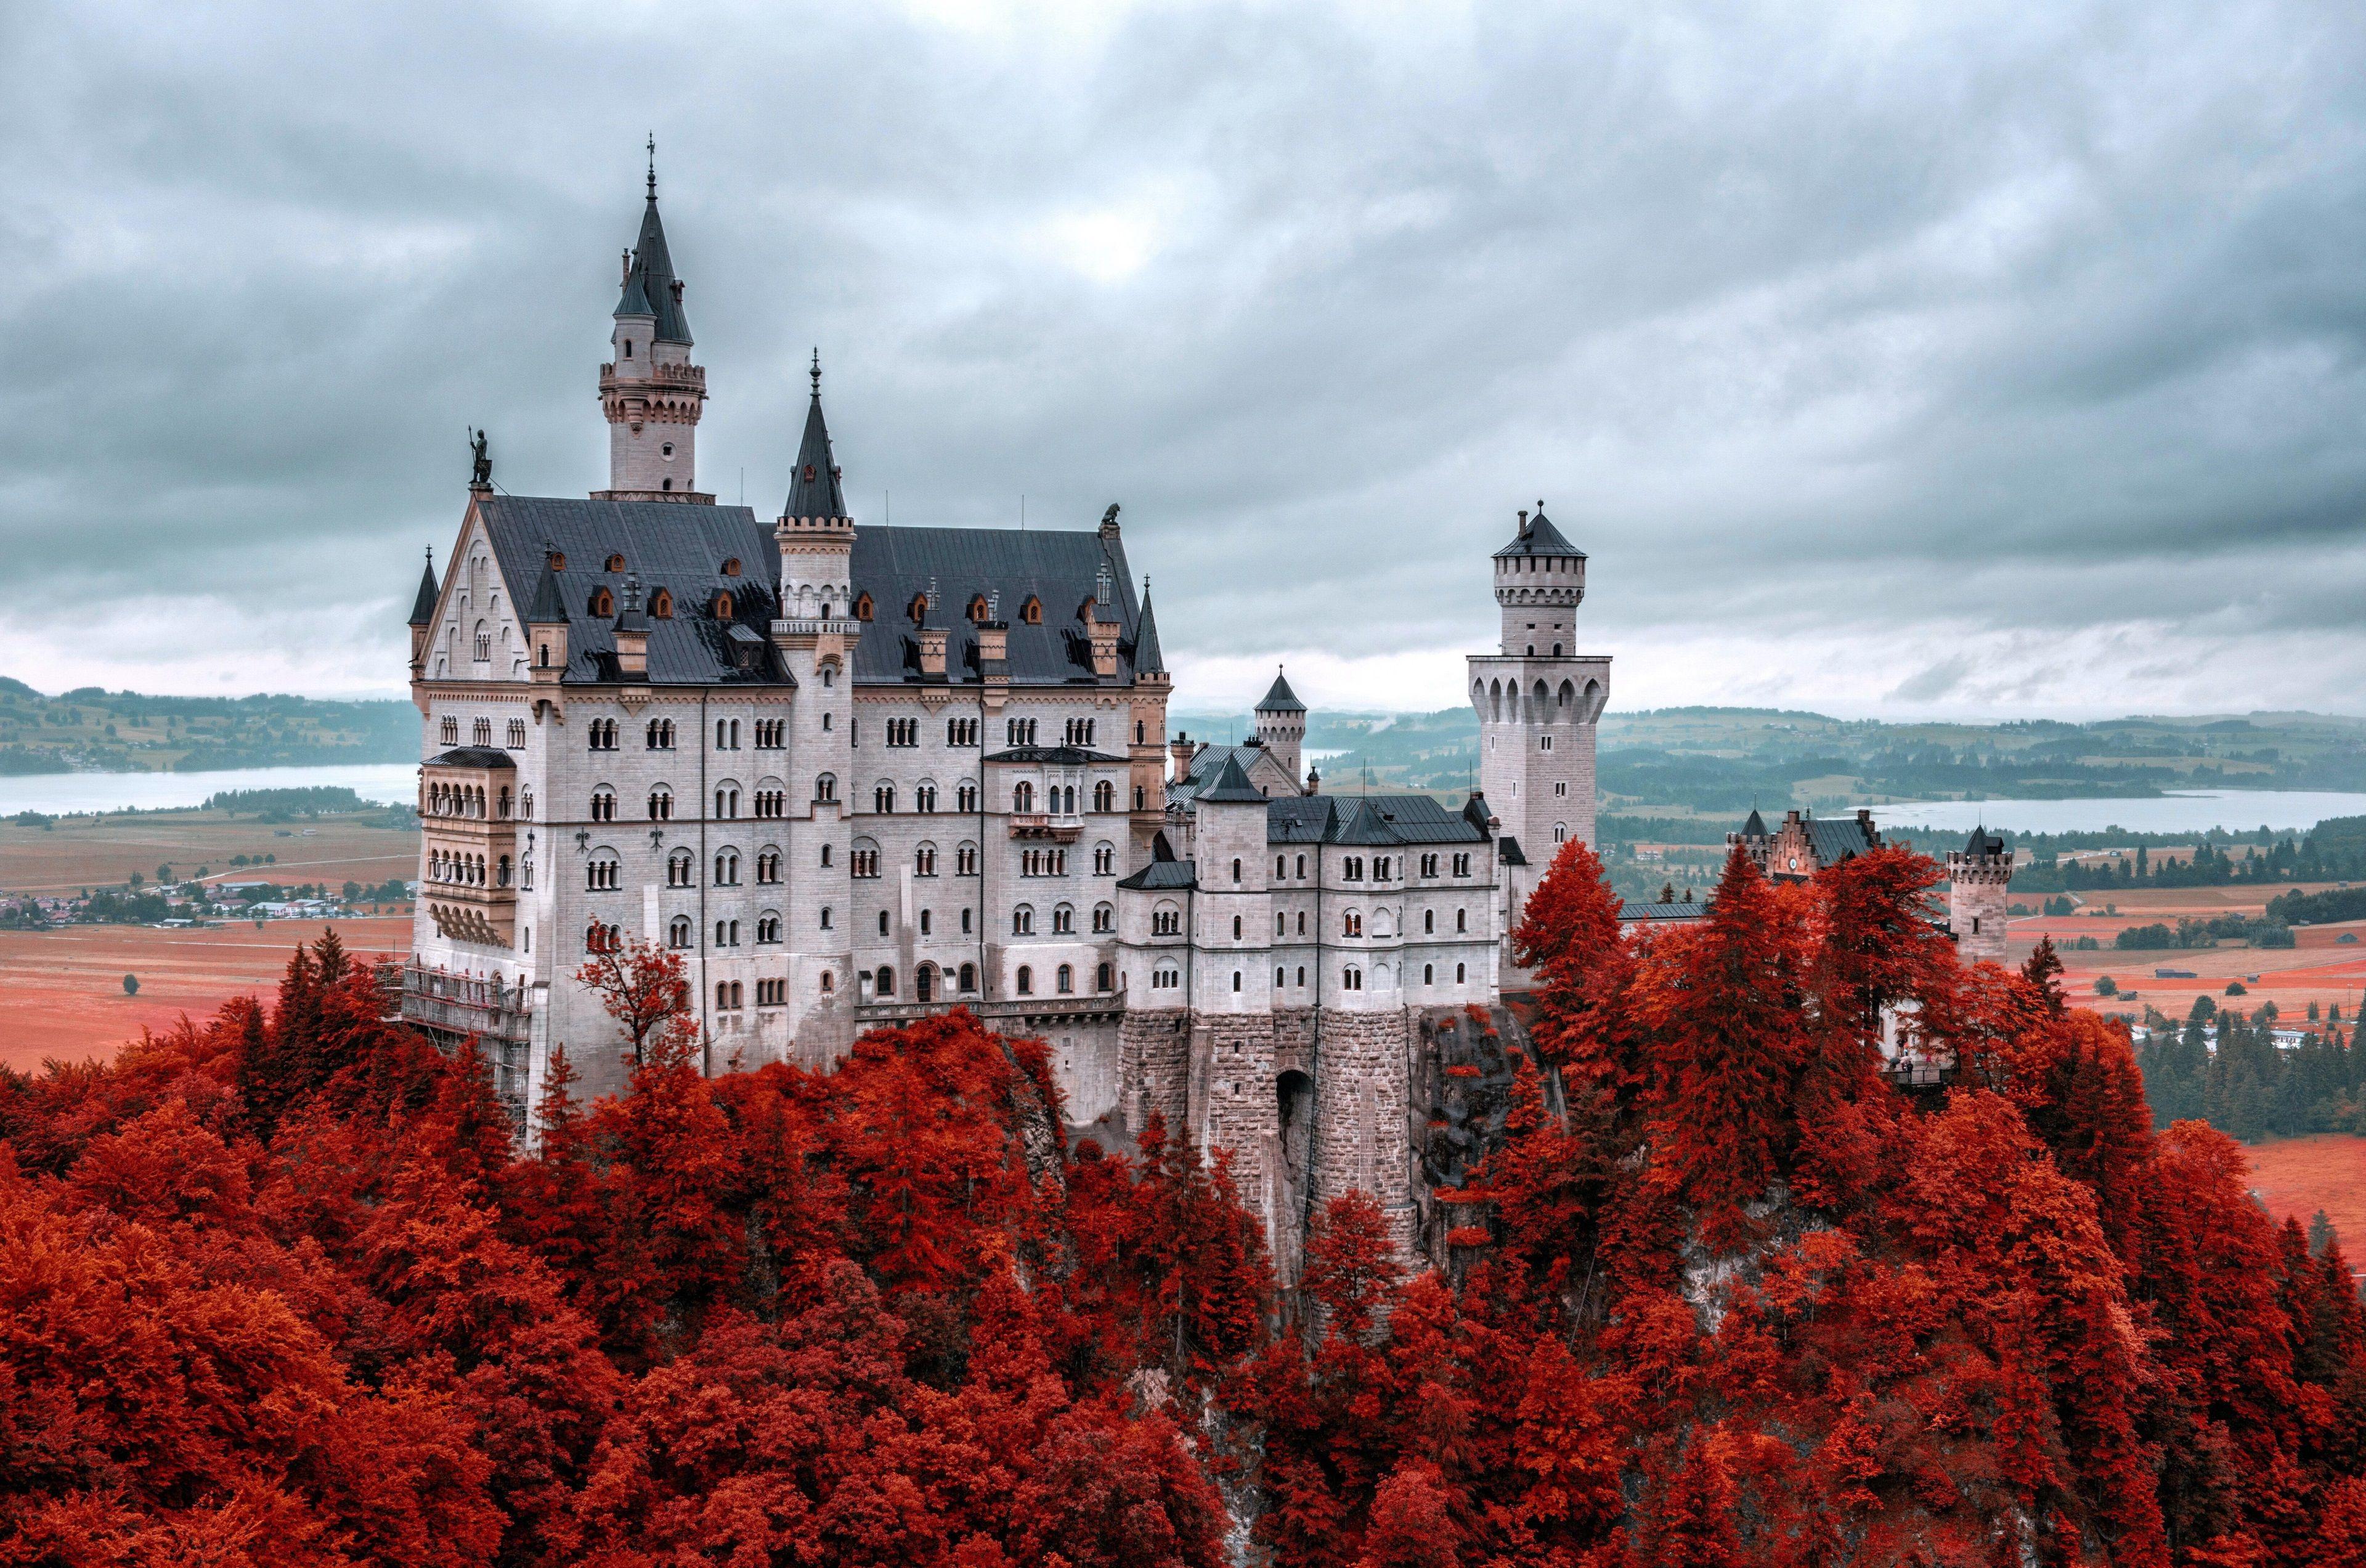 3840x2545 Neuschwanstein Castle 4k Wallpaper For Desktop Background Free Download Neuschwanstein Castle Germany Castles Castle